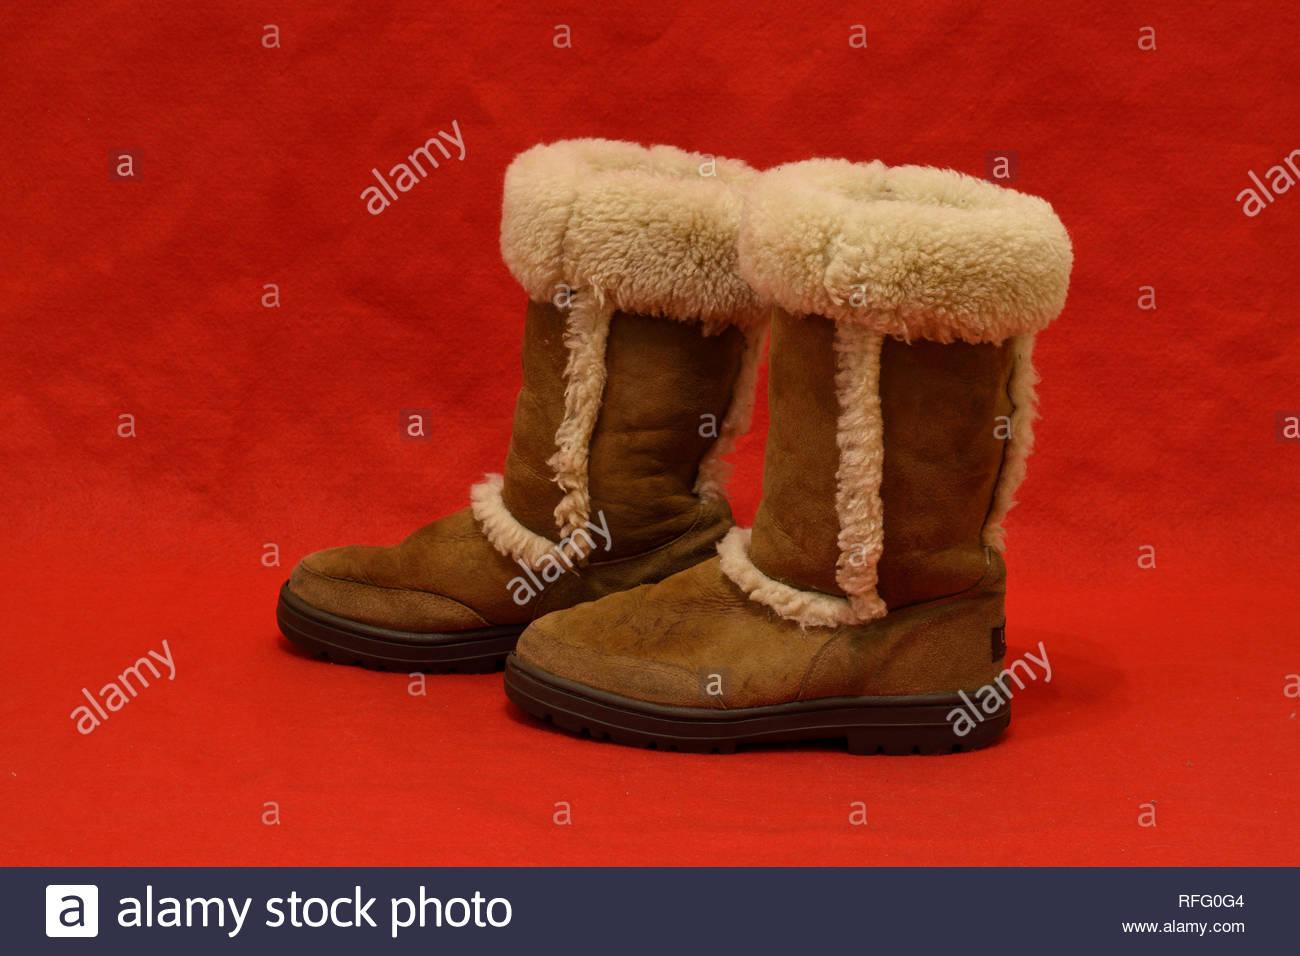 Boots Boots Bilder Stockfotosamp; Stockfotosamp; Alamy Ugg Ugg c3j5SRL4Aq